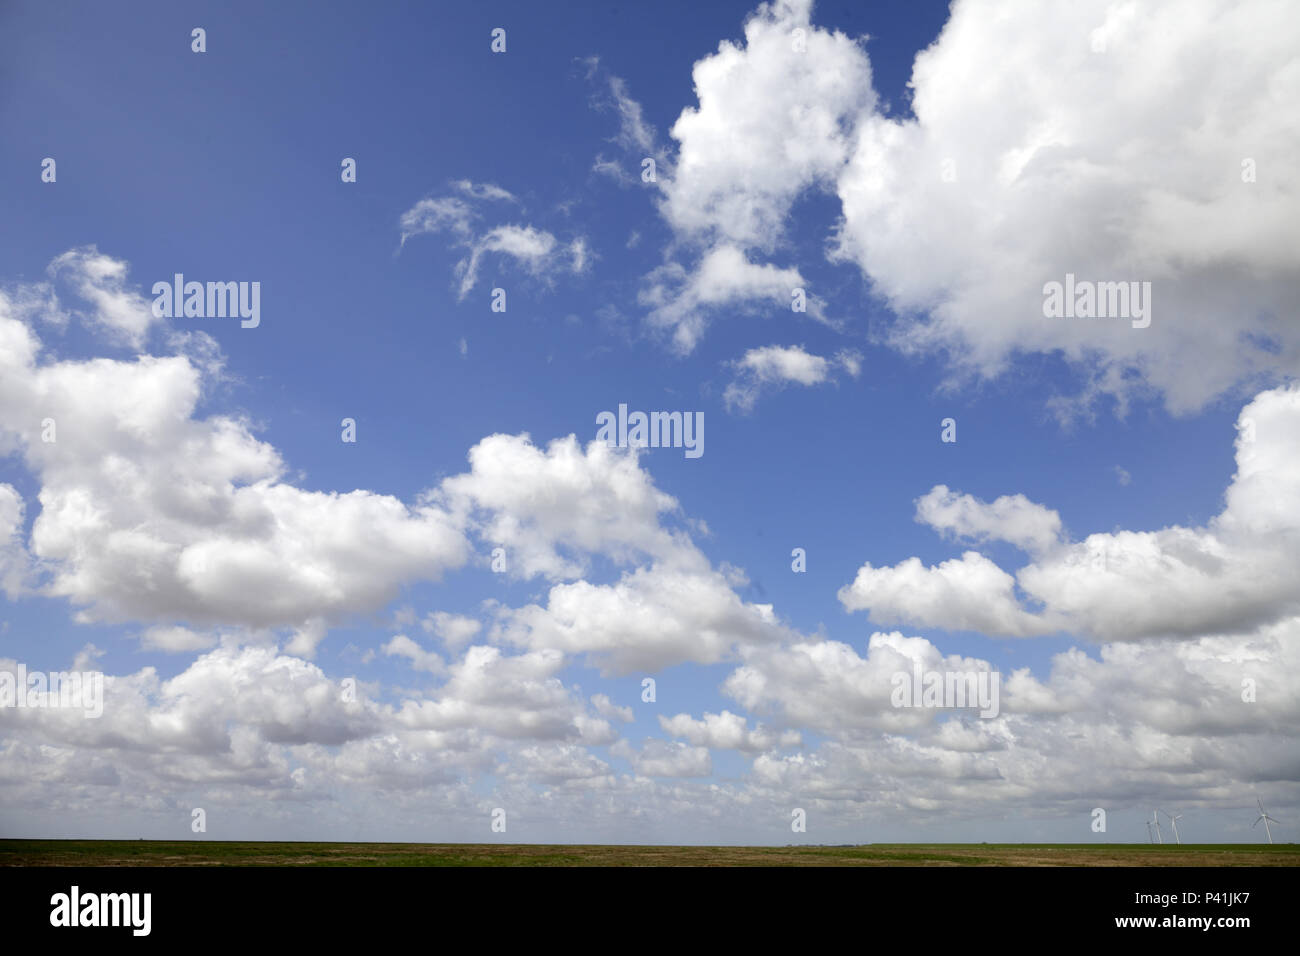 Soenke-Nissen-Koog, Deutschland, Cloud Himmel bei Soenke-Nissen-Koog ...